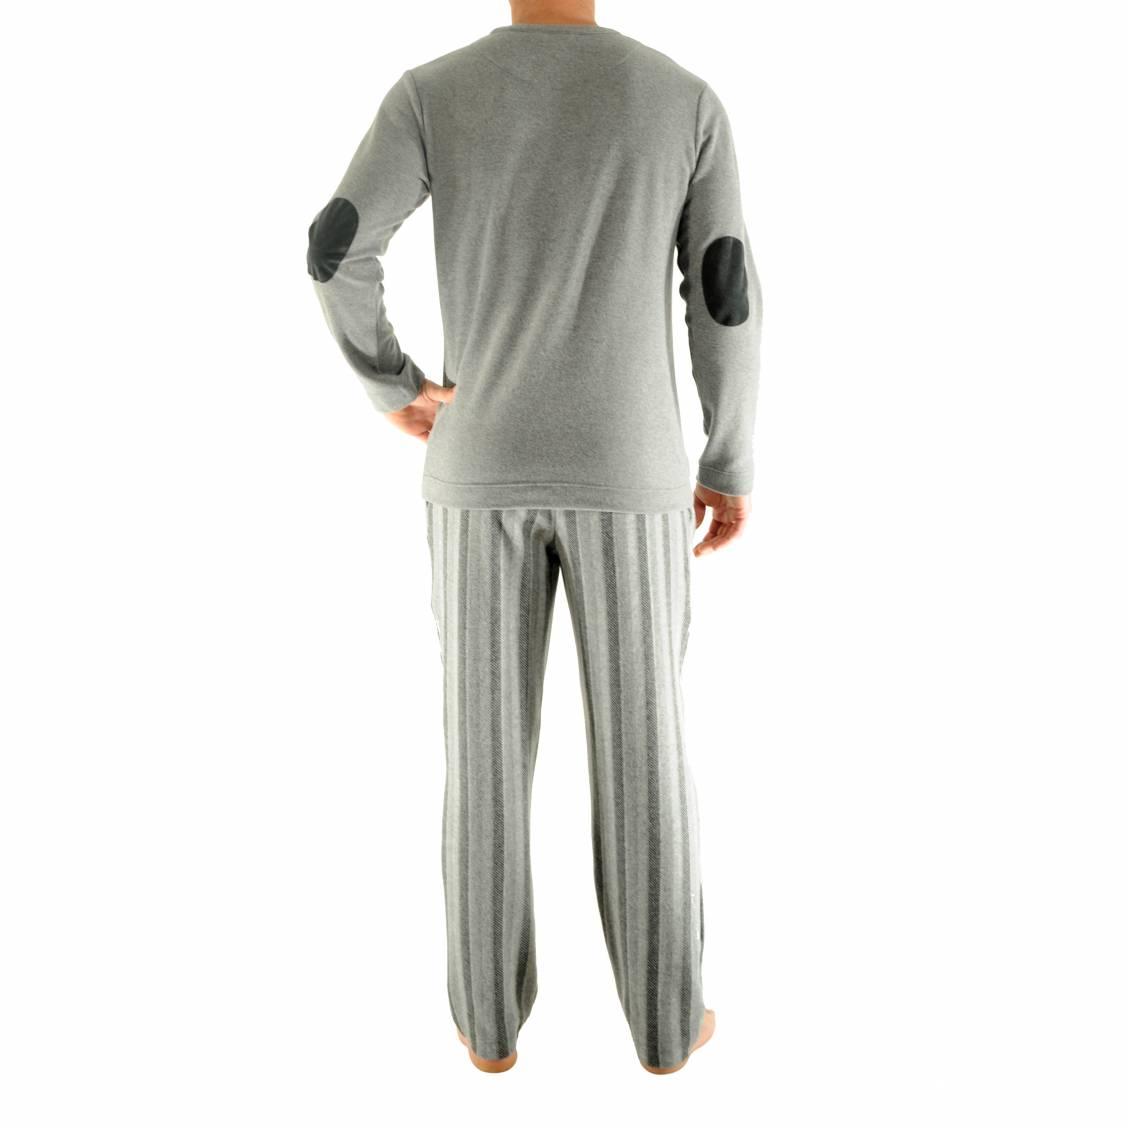 pyjama jules pilus tee shirt manches longues gris clair. Black Bedroom Furniture Sets. Home Design Ideas